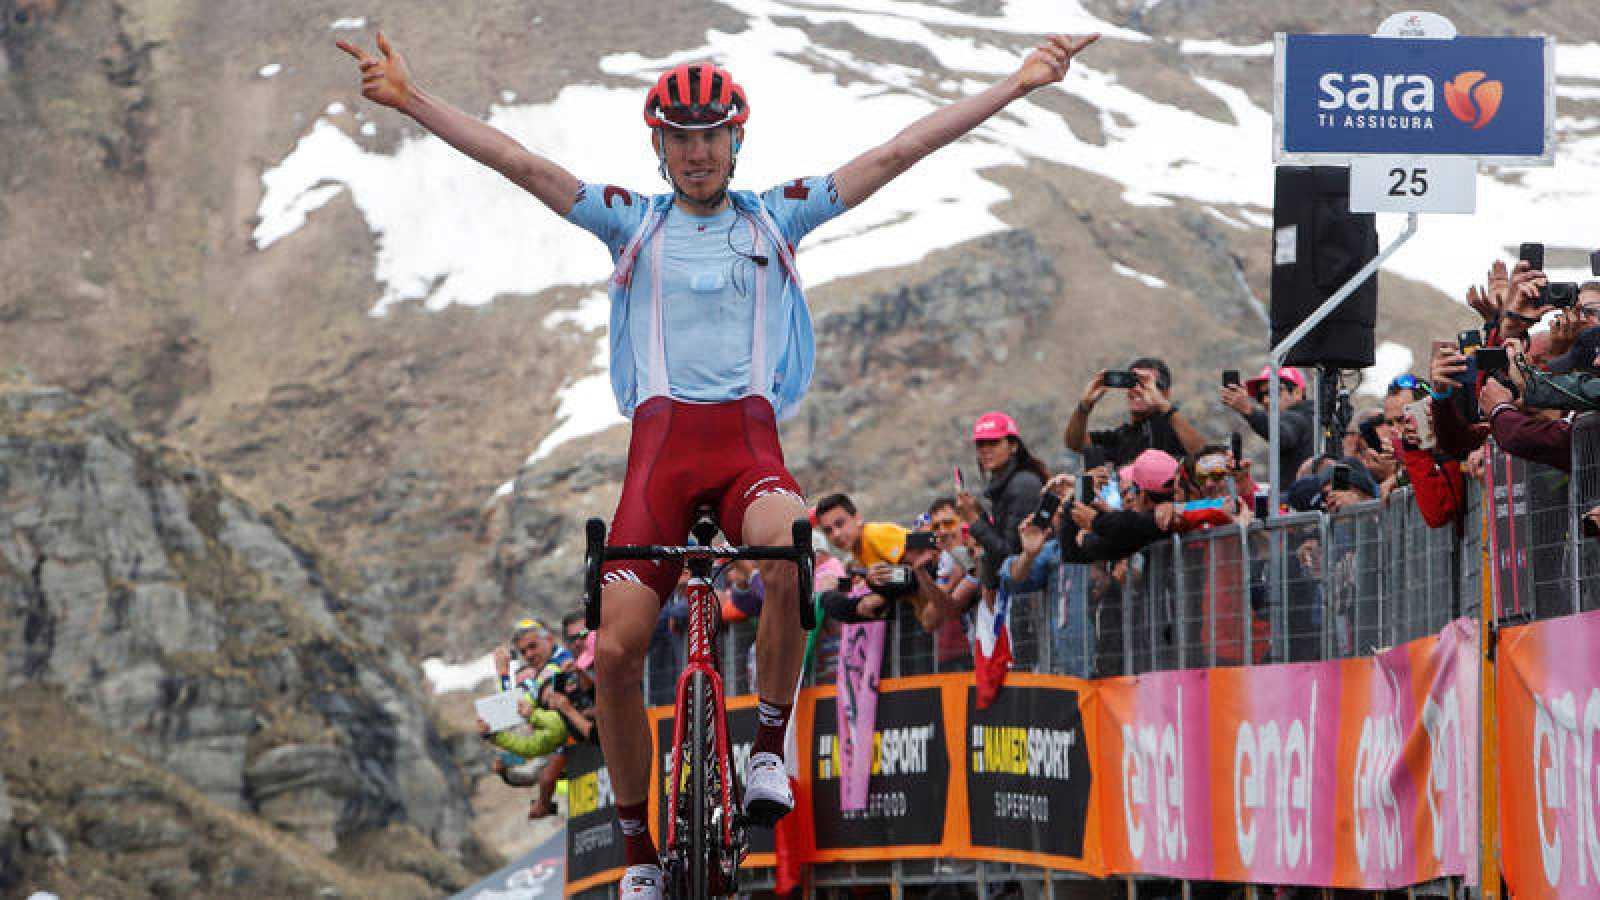 Ruso Ilnur Zakarin gana etapa de alta montaña en el Giro  | Internacional | Deportes | EL FRENTE